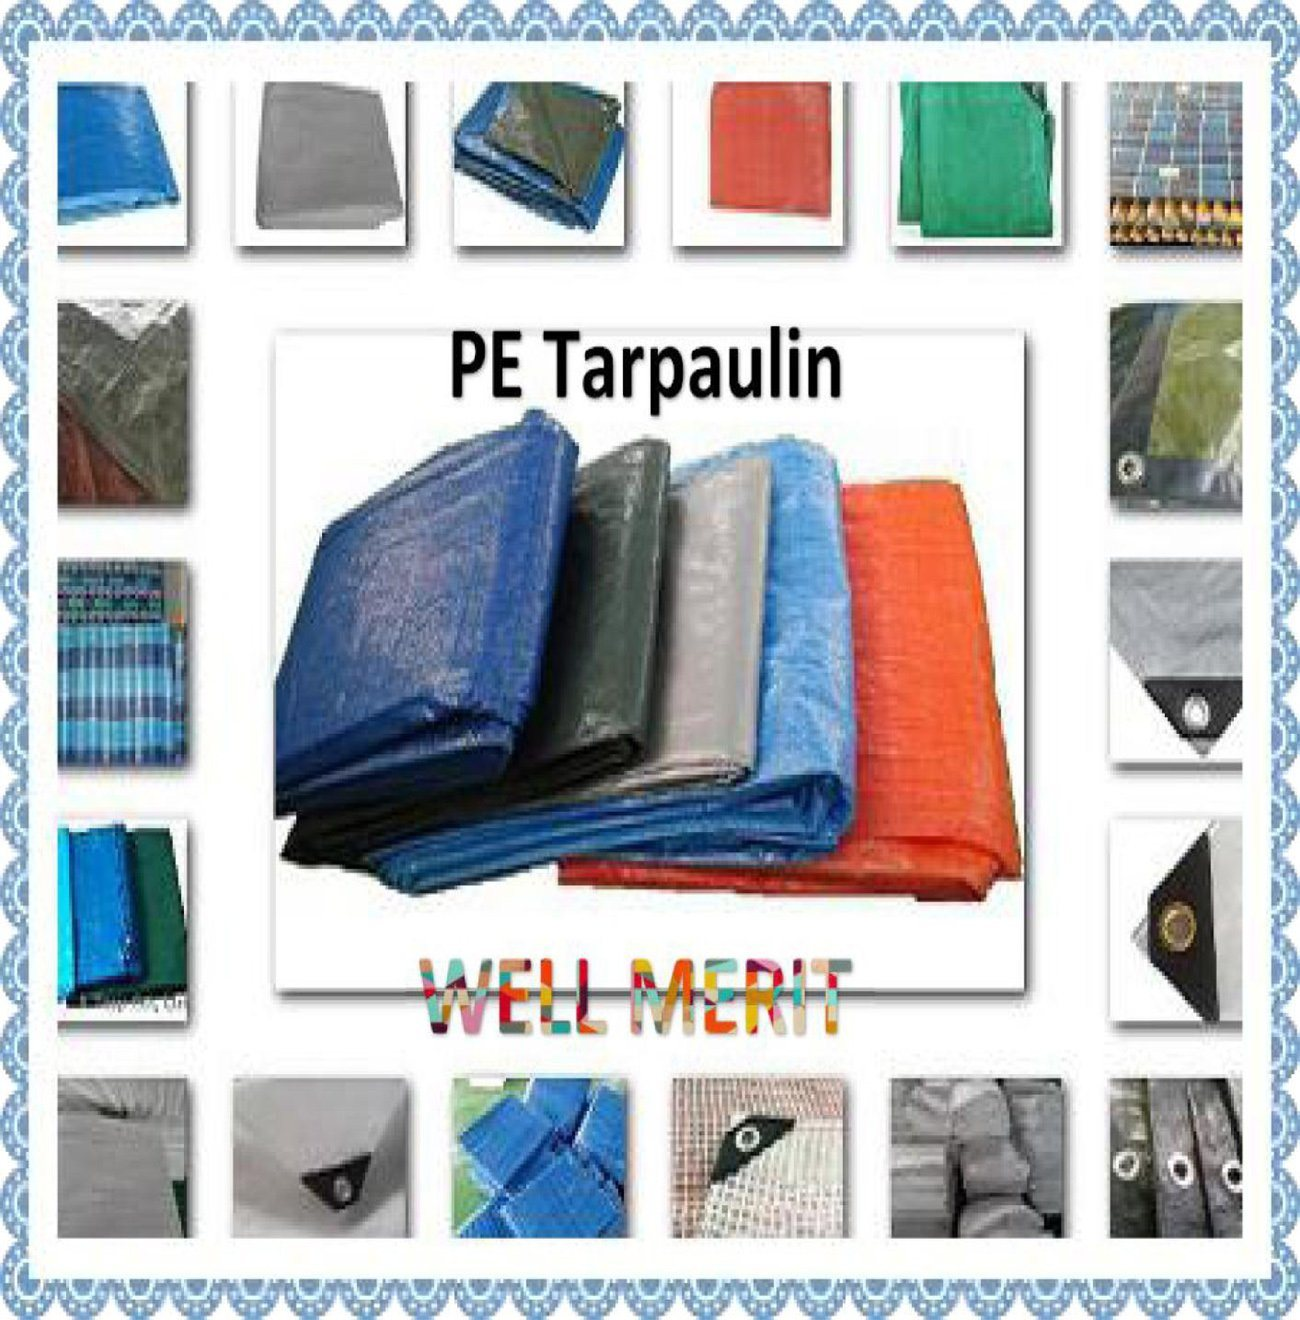 50GSM-300GSM PE Tarpaulin Poly Tarp Plastic Sheet Truck Cover Tarpaulin